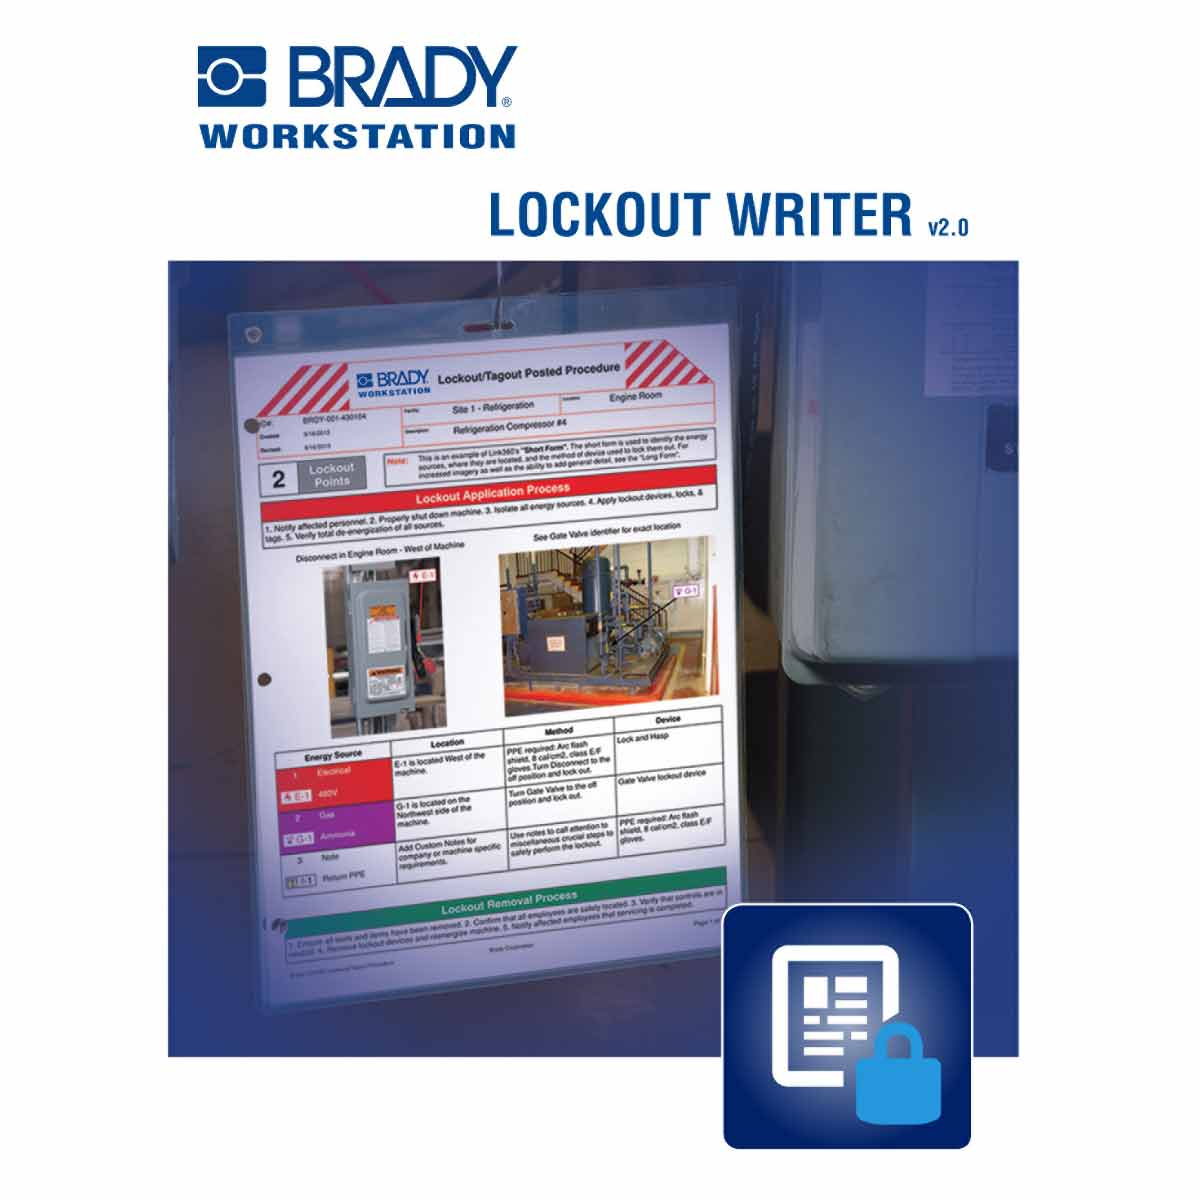 Brady® MarkWare™ 20700 Software Kit, Software Title: MarkWare™ Software Kit, Operating System Compatibility: BBP®31, BBP®33, BBP®85, BMP®71, GlobalMark®, HandiMark®, MiniMark™, PowerMark® Label Printers, CD-ROM Drive